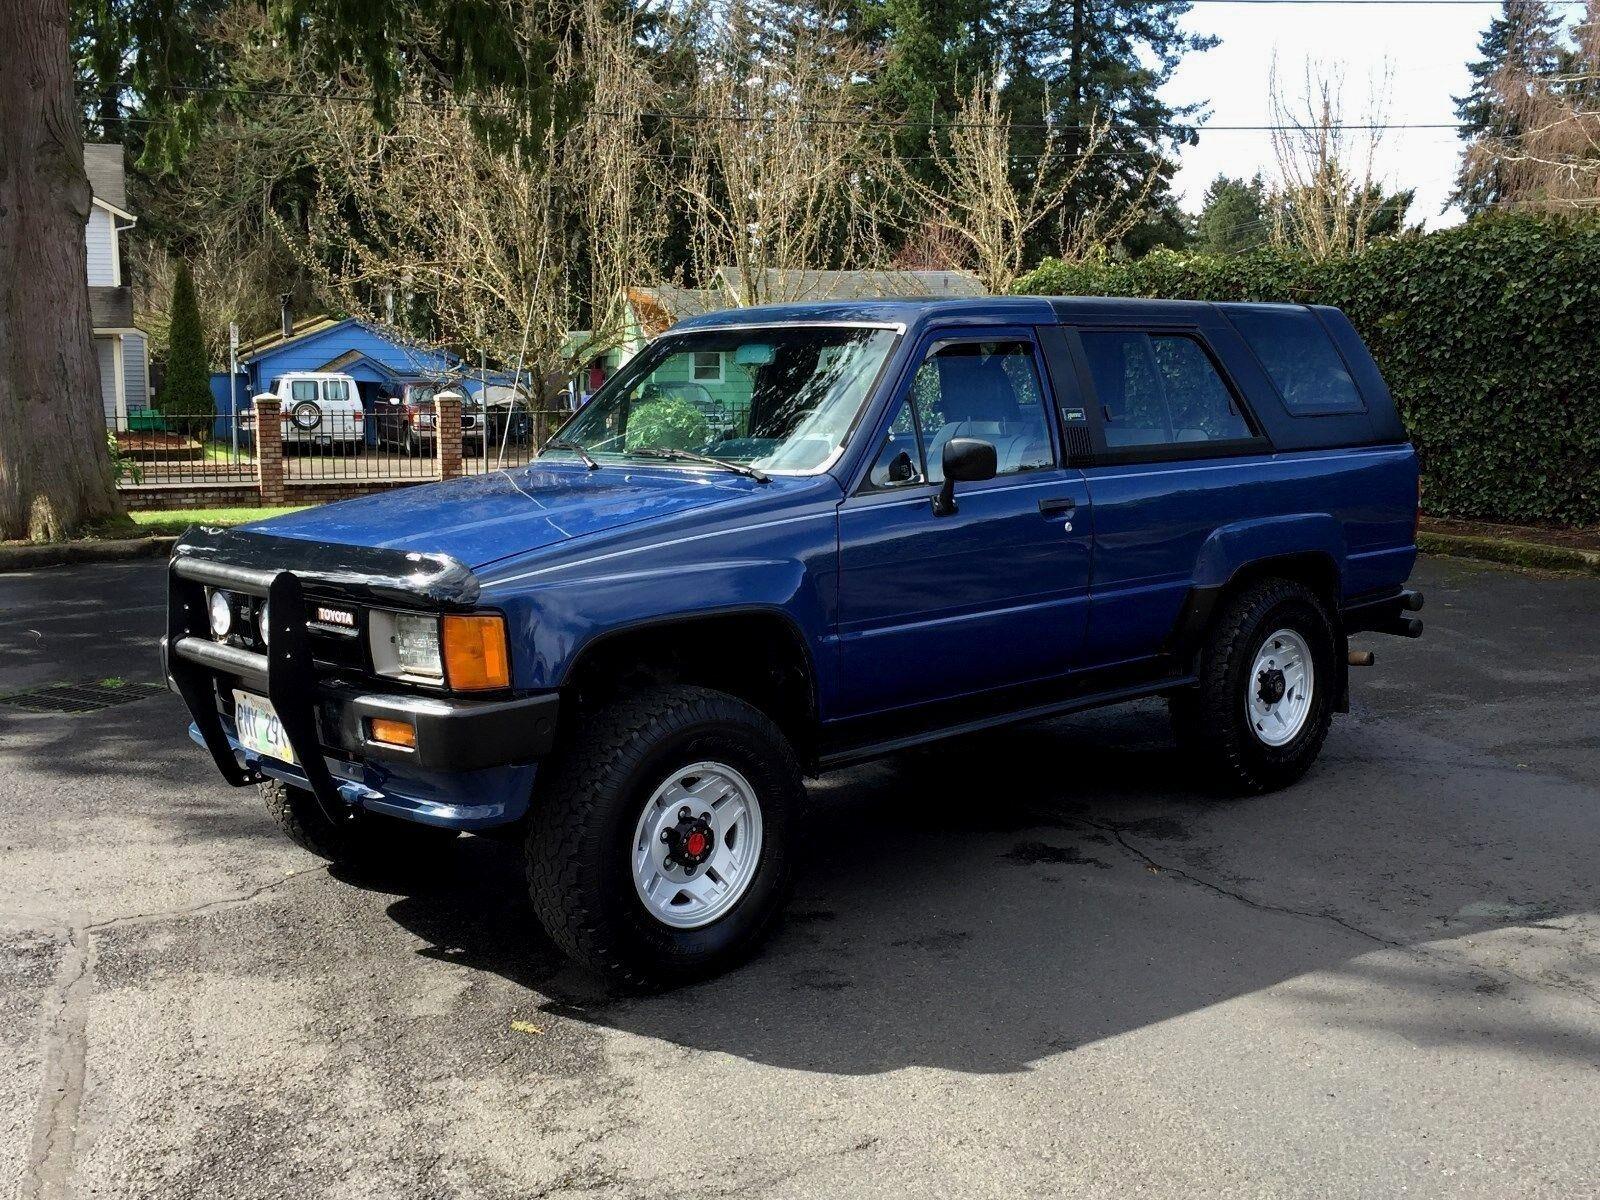 1986 Toyota 4 Runner 4x4 5 Speed 22re 4 Cyl Eng 125k Orig